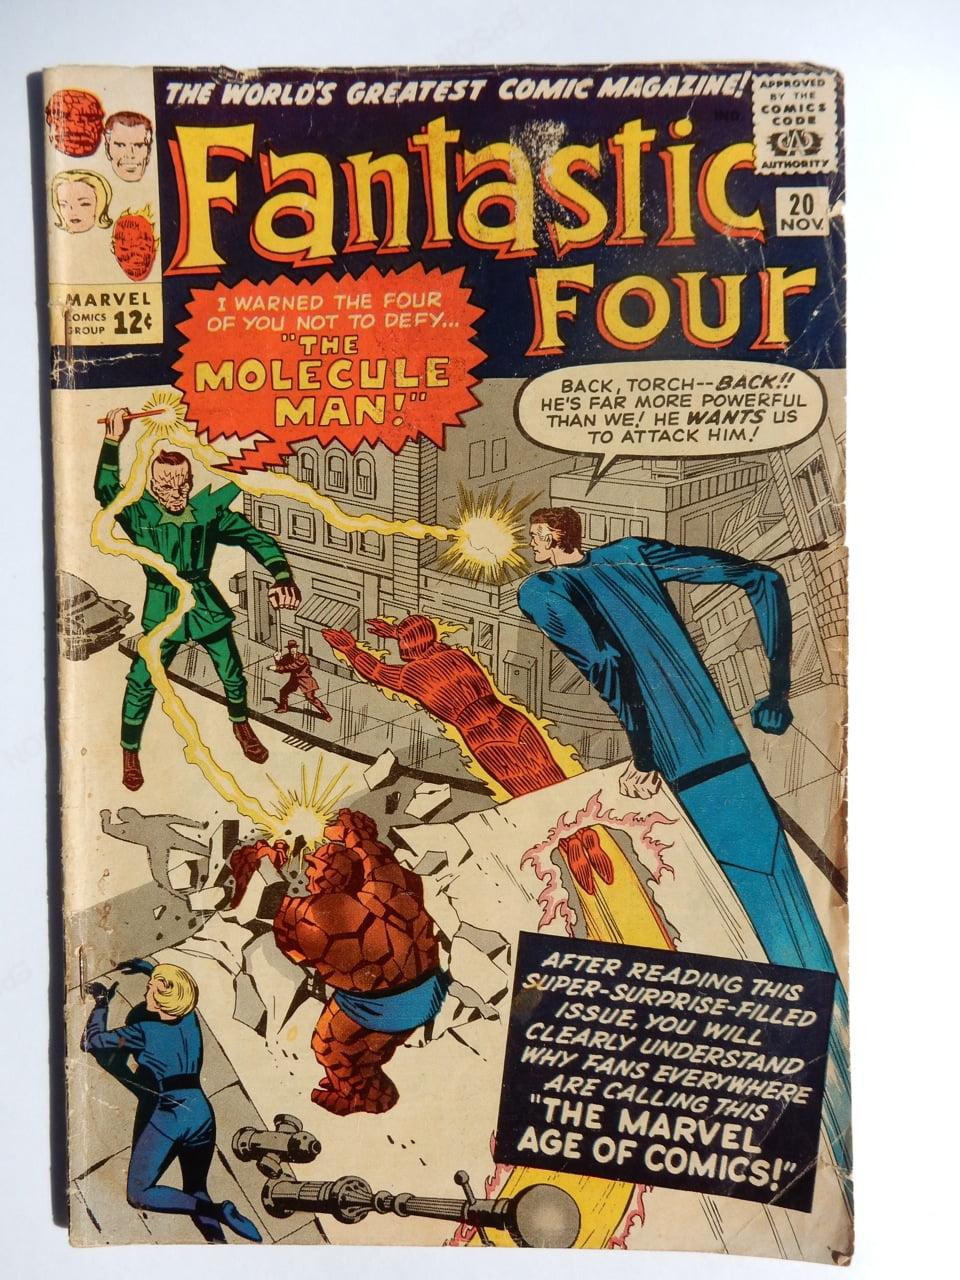 Fantastic Four #20